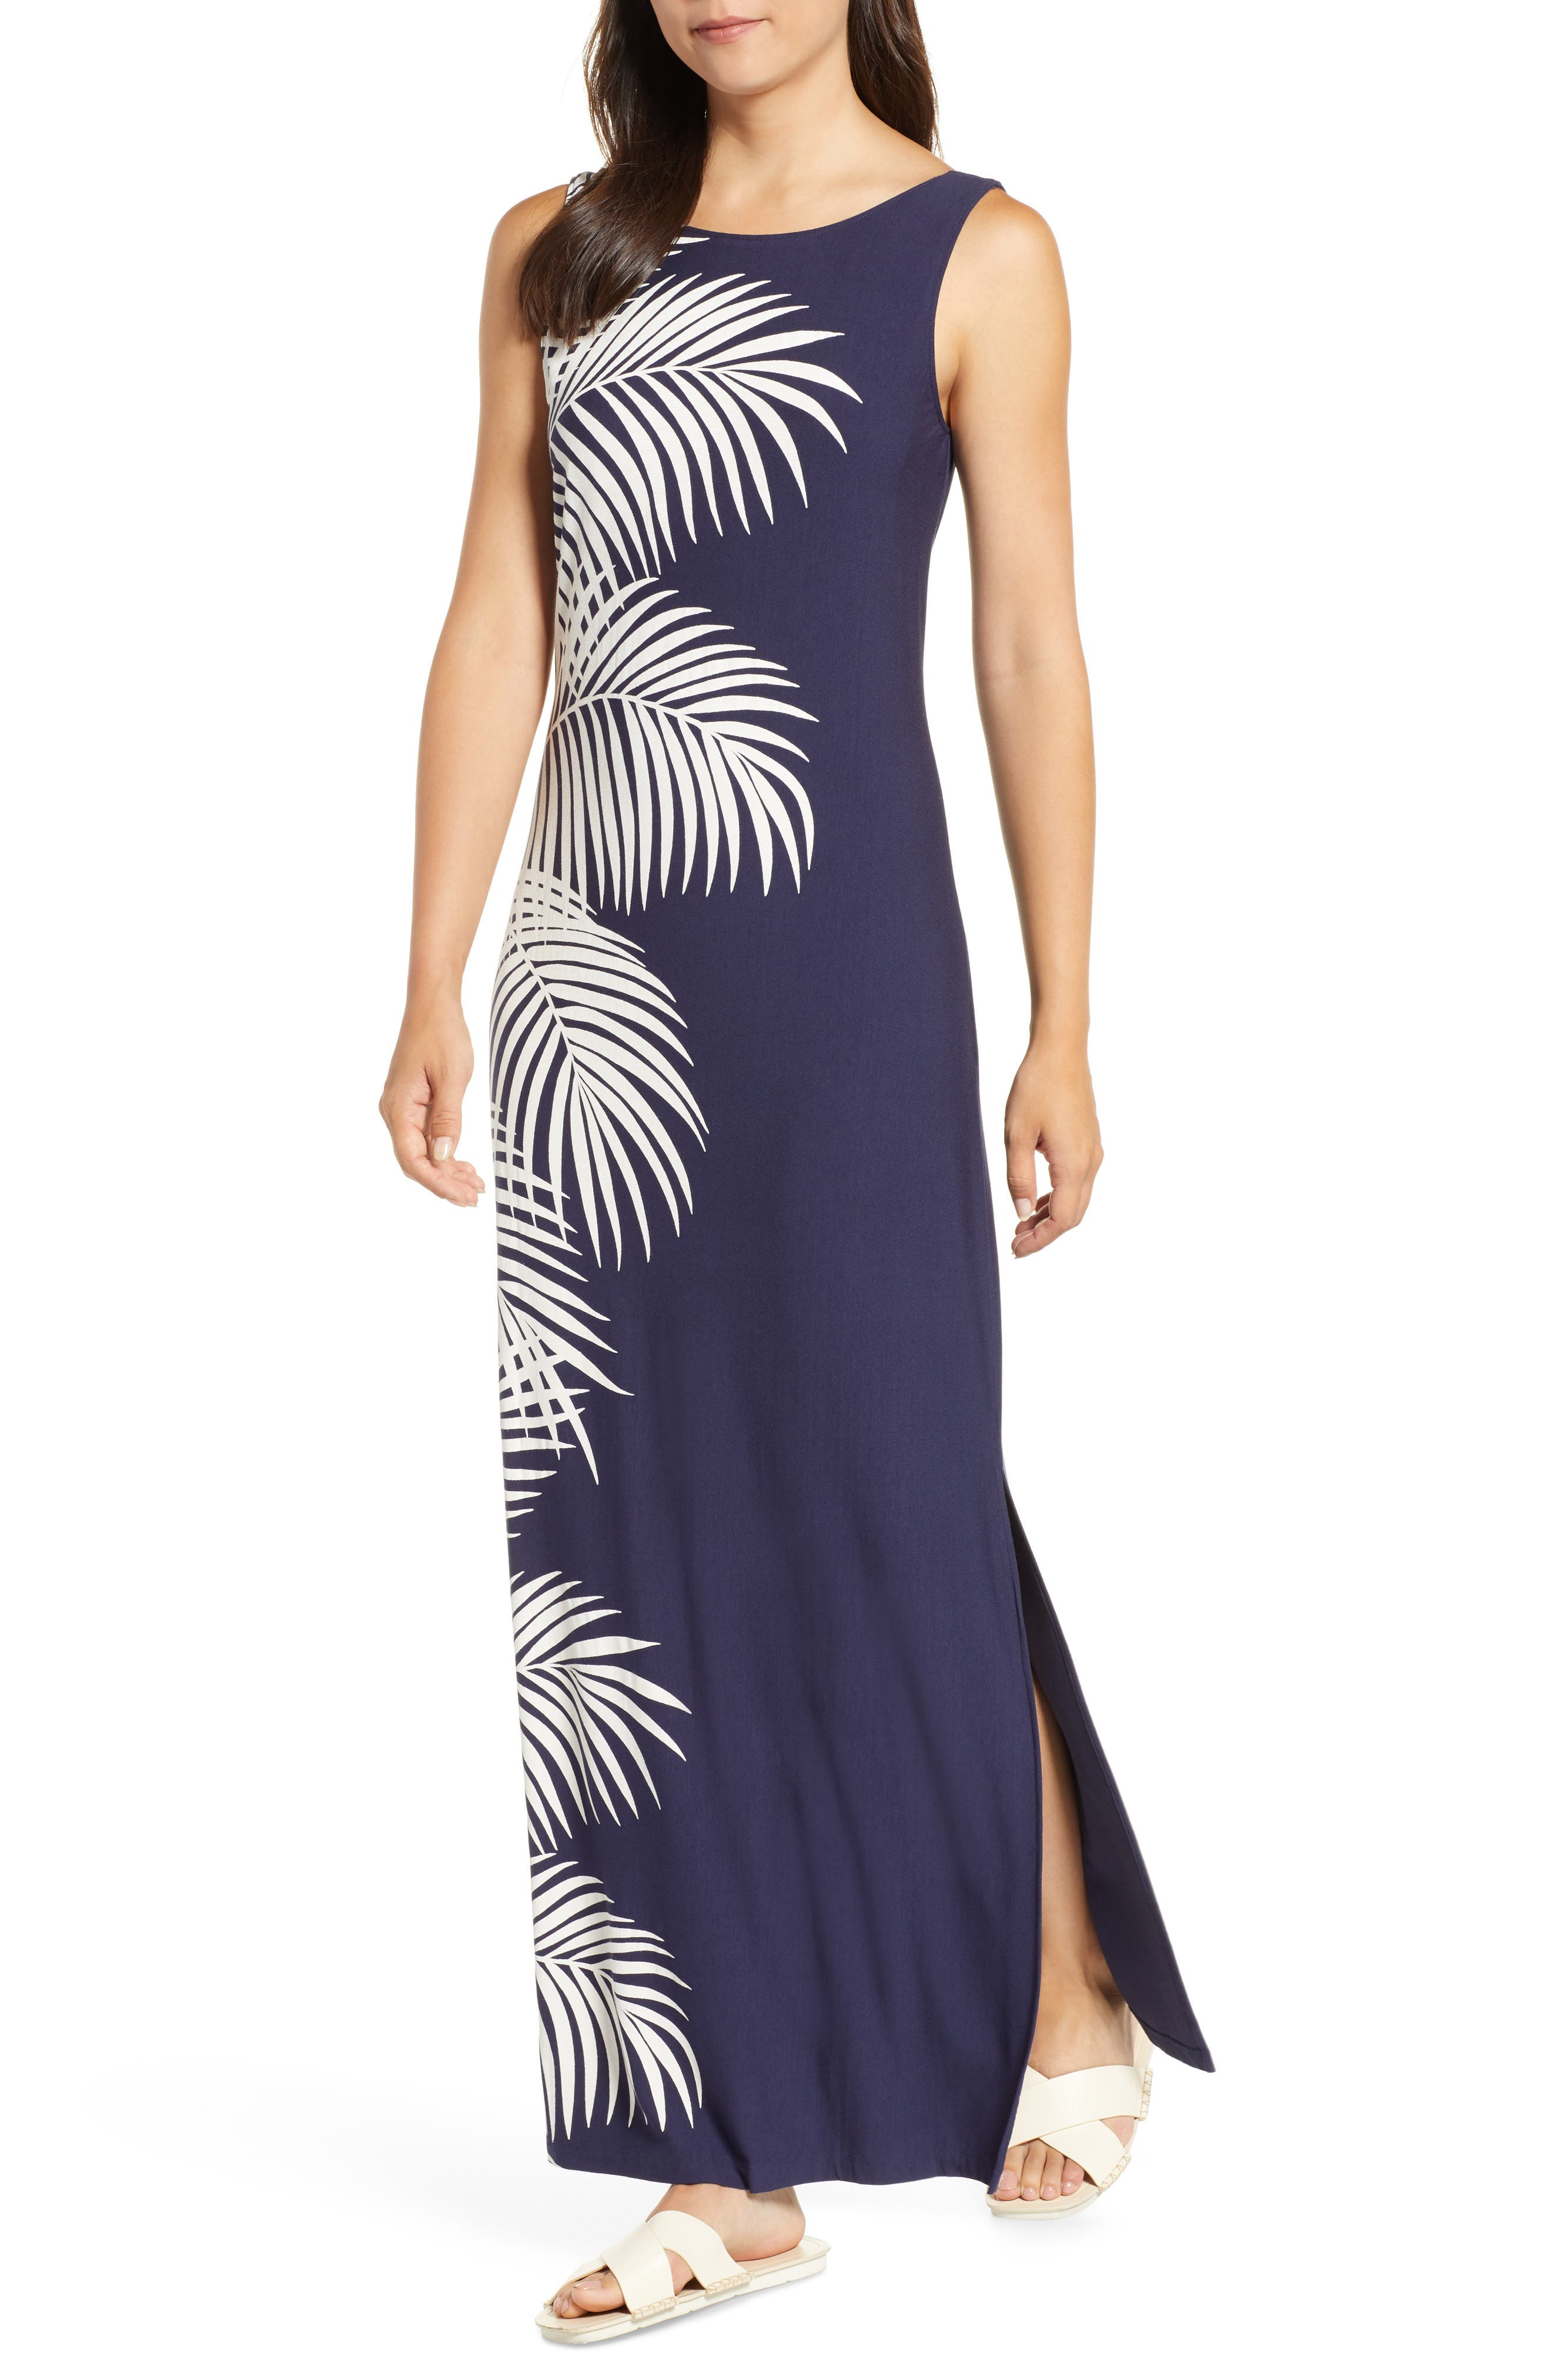 Gentlemen Prefer Fronds Maxi Dress,                             Main thumbnail 1, color,                             OCEAN DEEP